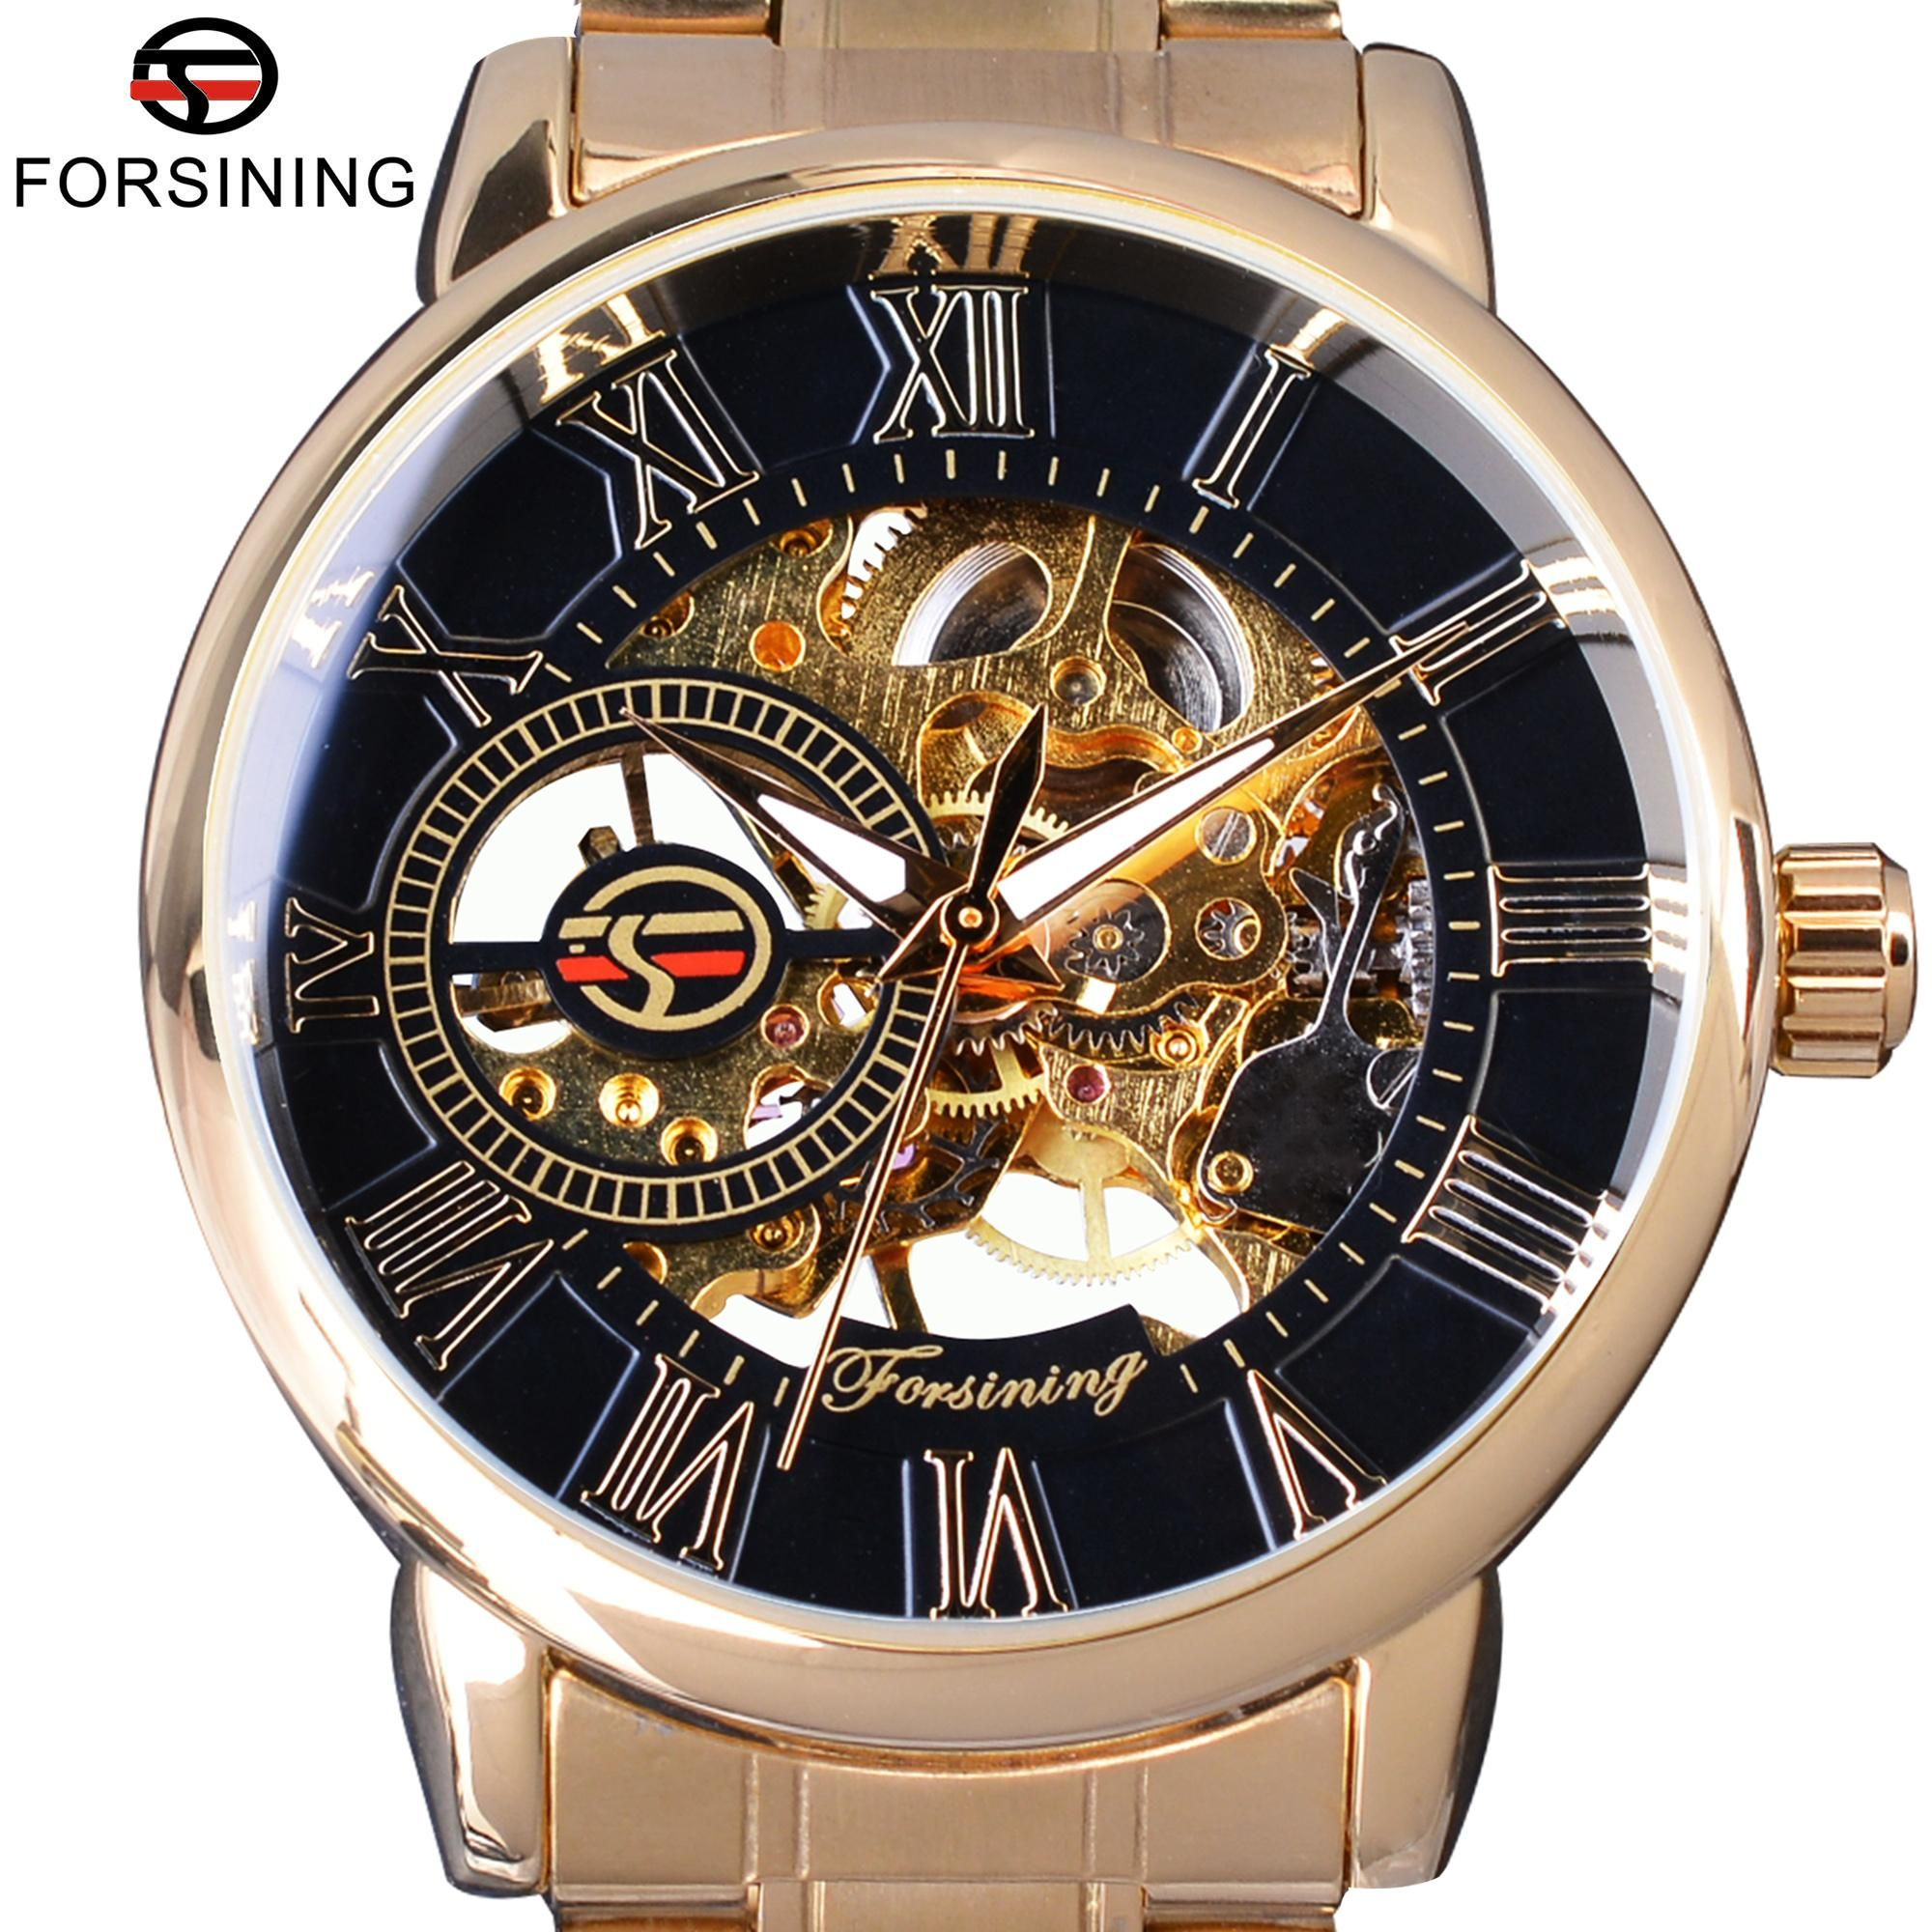 Forsining Fashion Wearing Retro Design Mechanical Skeleton Watch Steampunk  Design Transparent Mens Watch Top Brand Luxury Clock 9797916a317